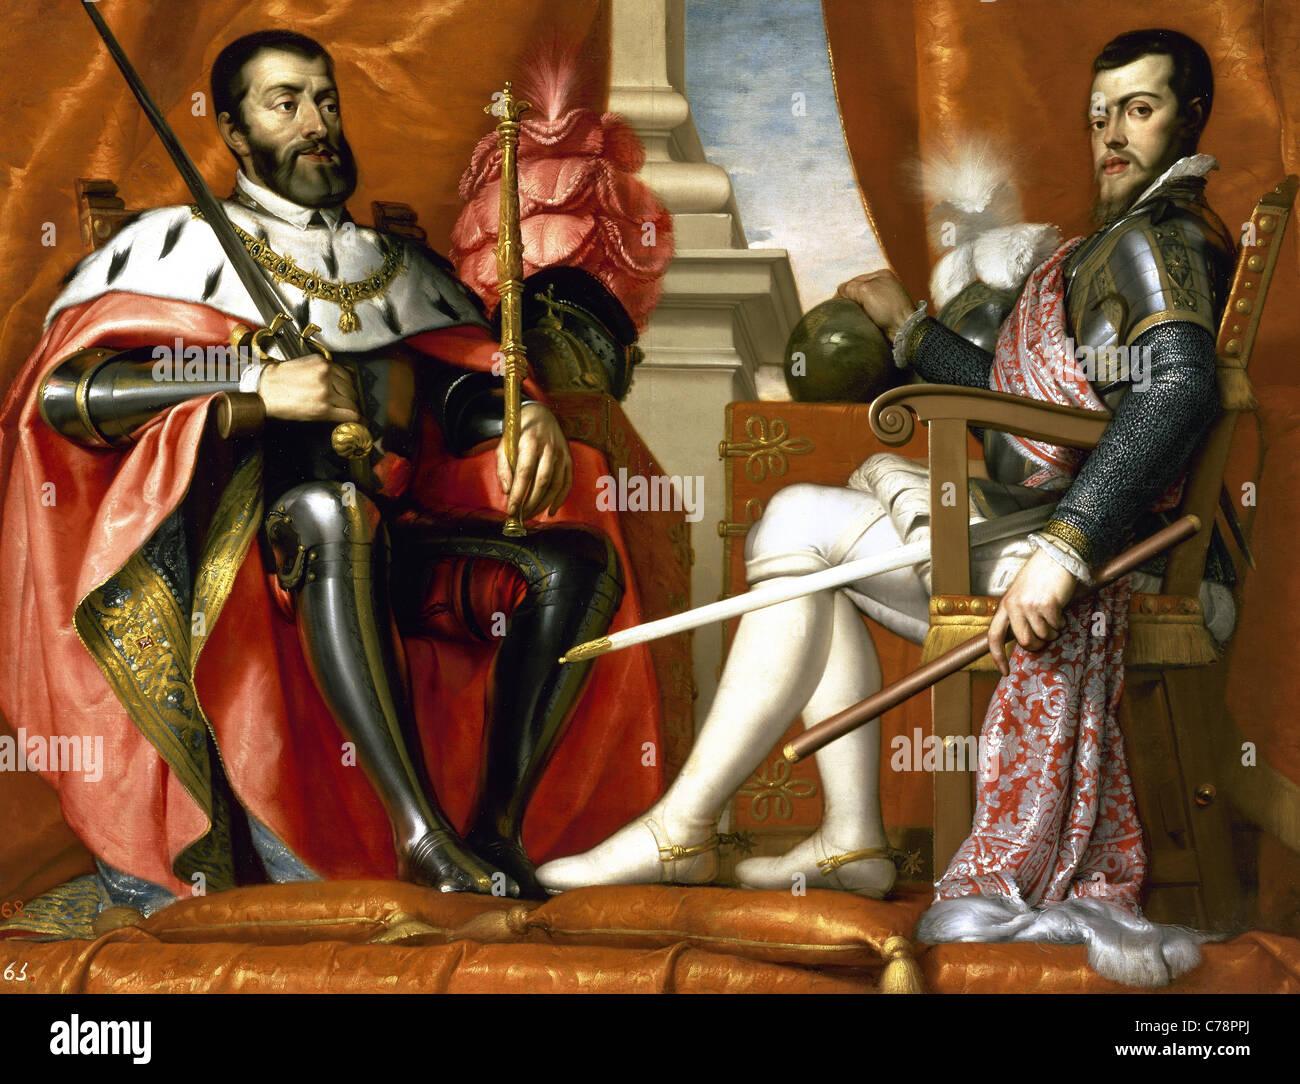 Philip II (1527-1598) and Charles I (1500-1558). Kings of Spain. Portrait by Antonio Arias. Prado Museum. Madrid. Stock Photo